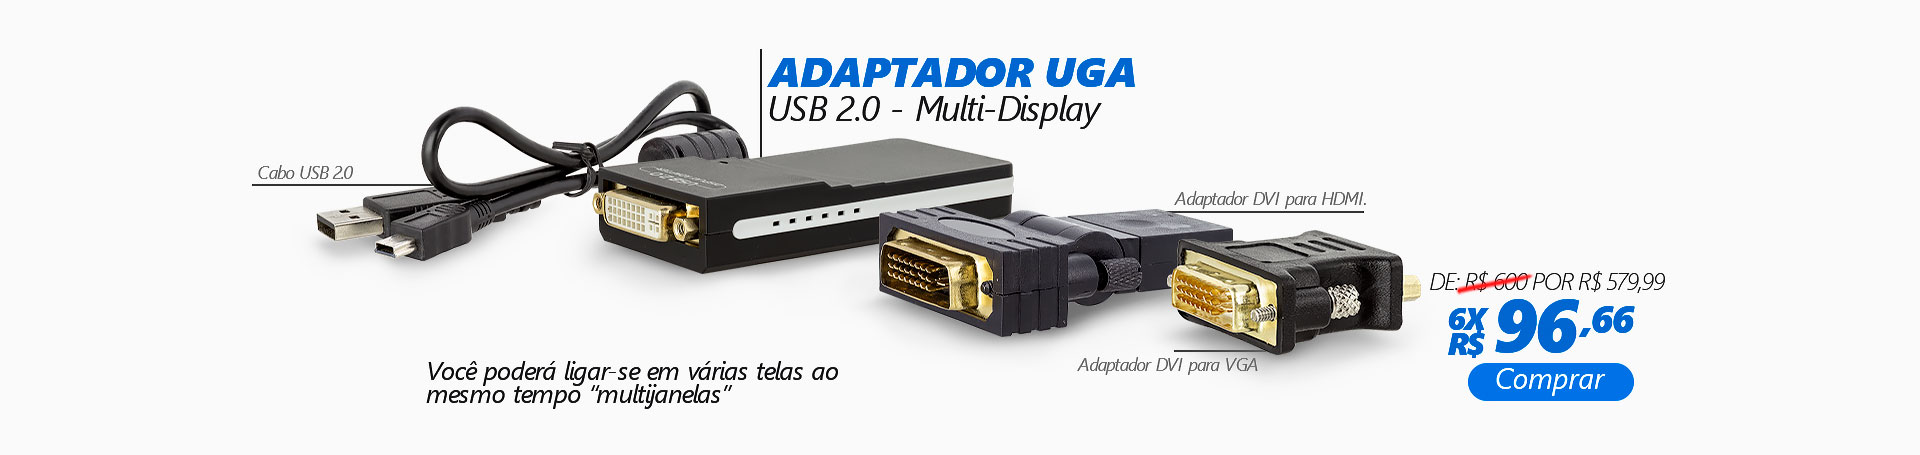 BANNER DESKTOP HOME - Adaptador USB 2.0 UGA Multi-Display